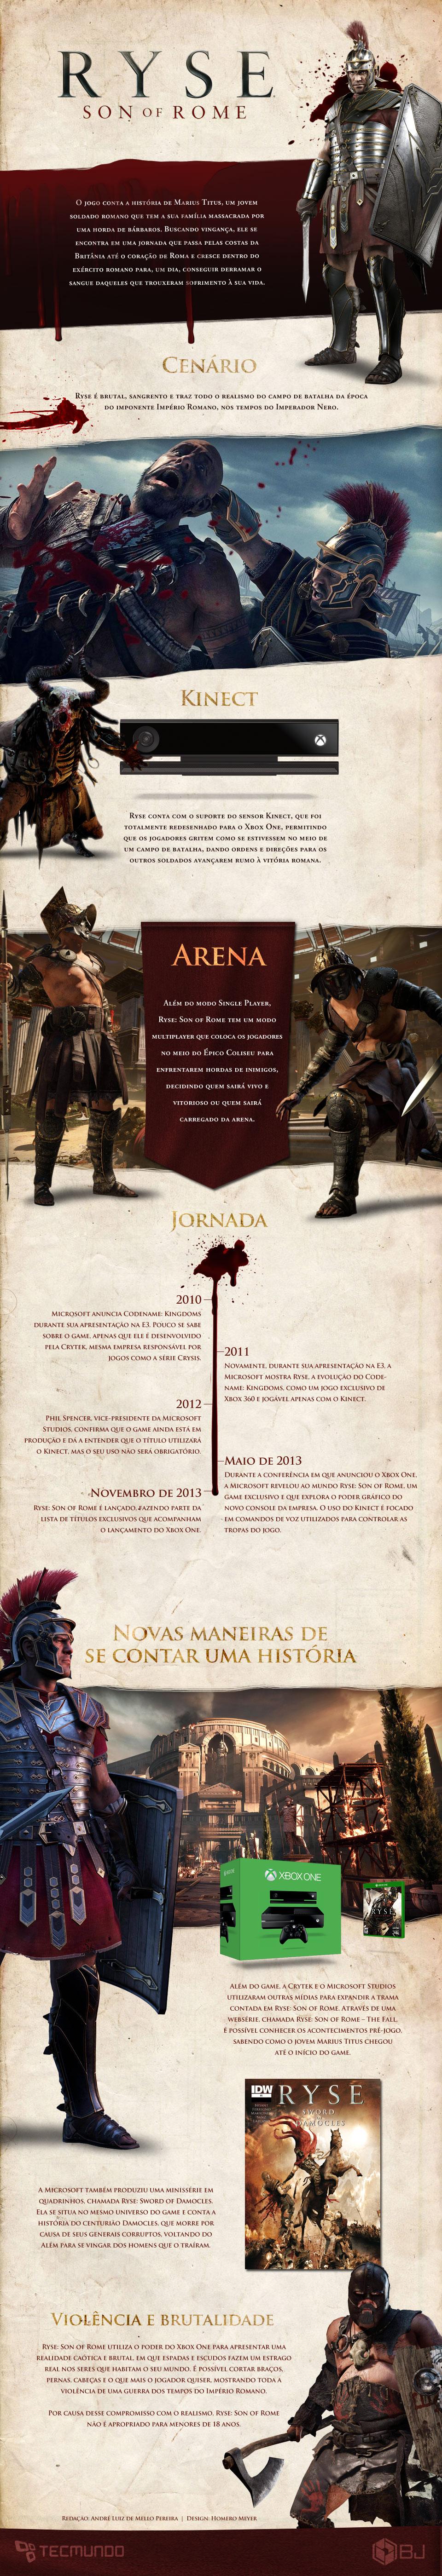 Ryse: Son of Rome traz o épico Império Romano ao Xbox One [infográfico]